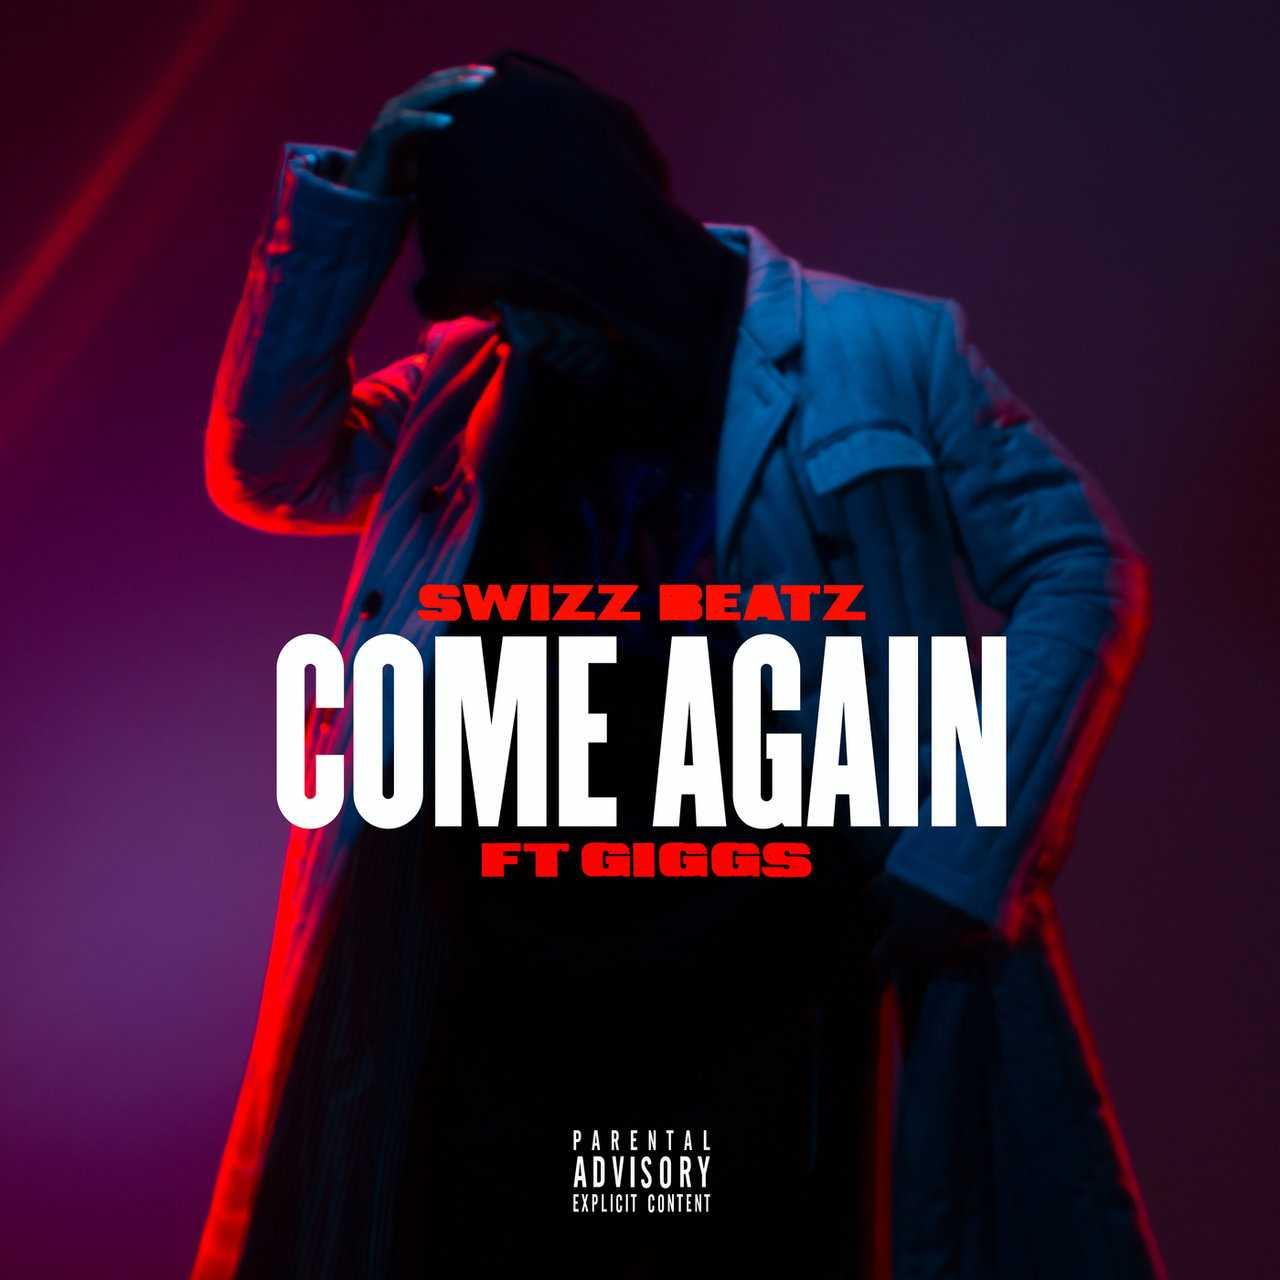 New Single: Swizz Beatz – Come Again (feat. Giggs) [Audio]